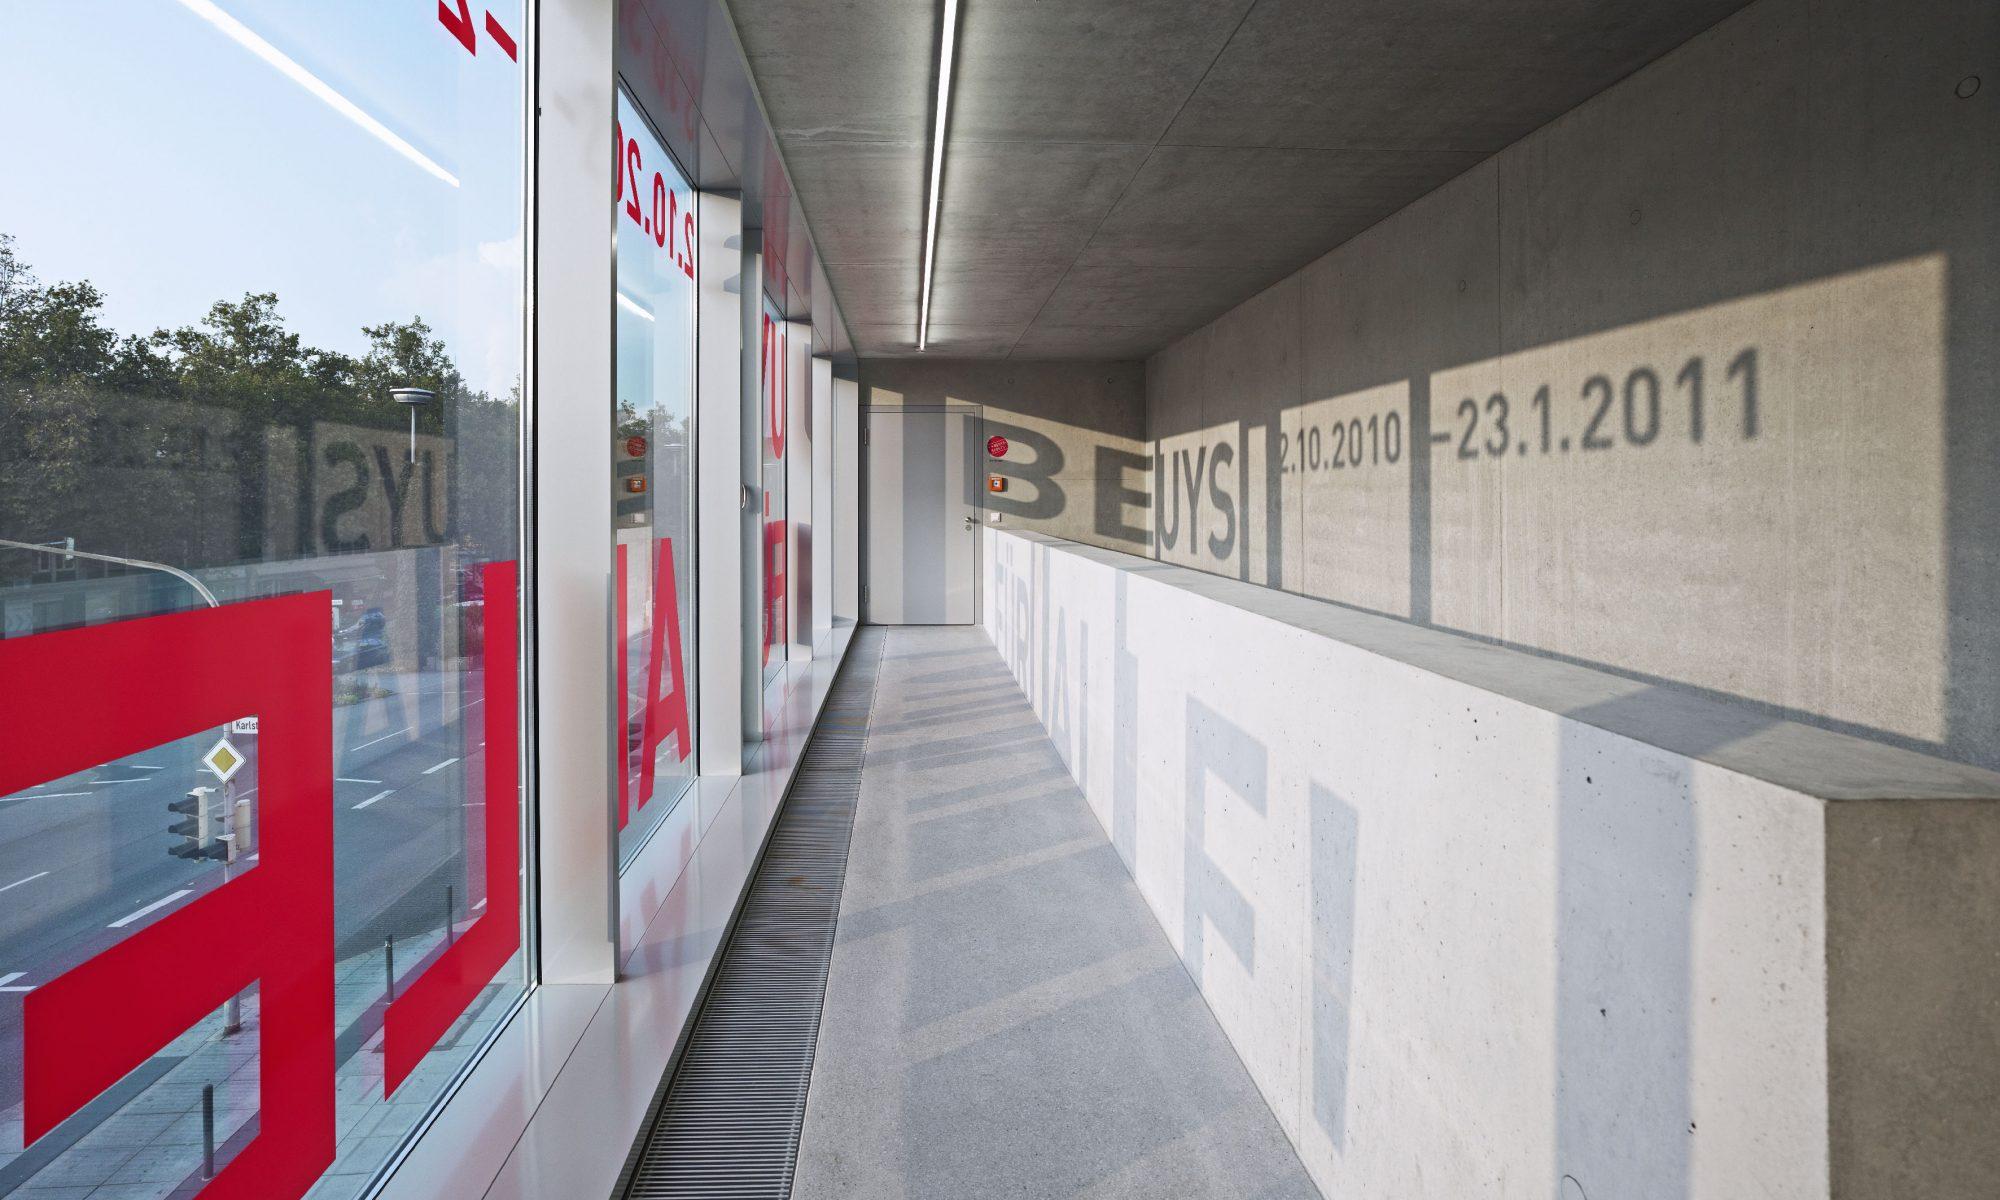 Zugang zur Museumspädagogik